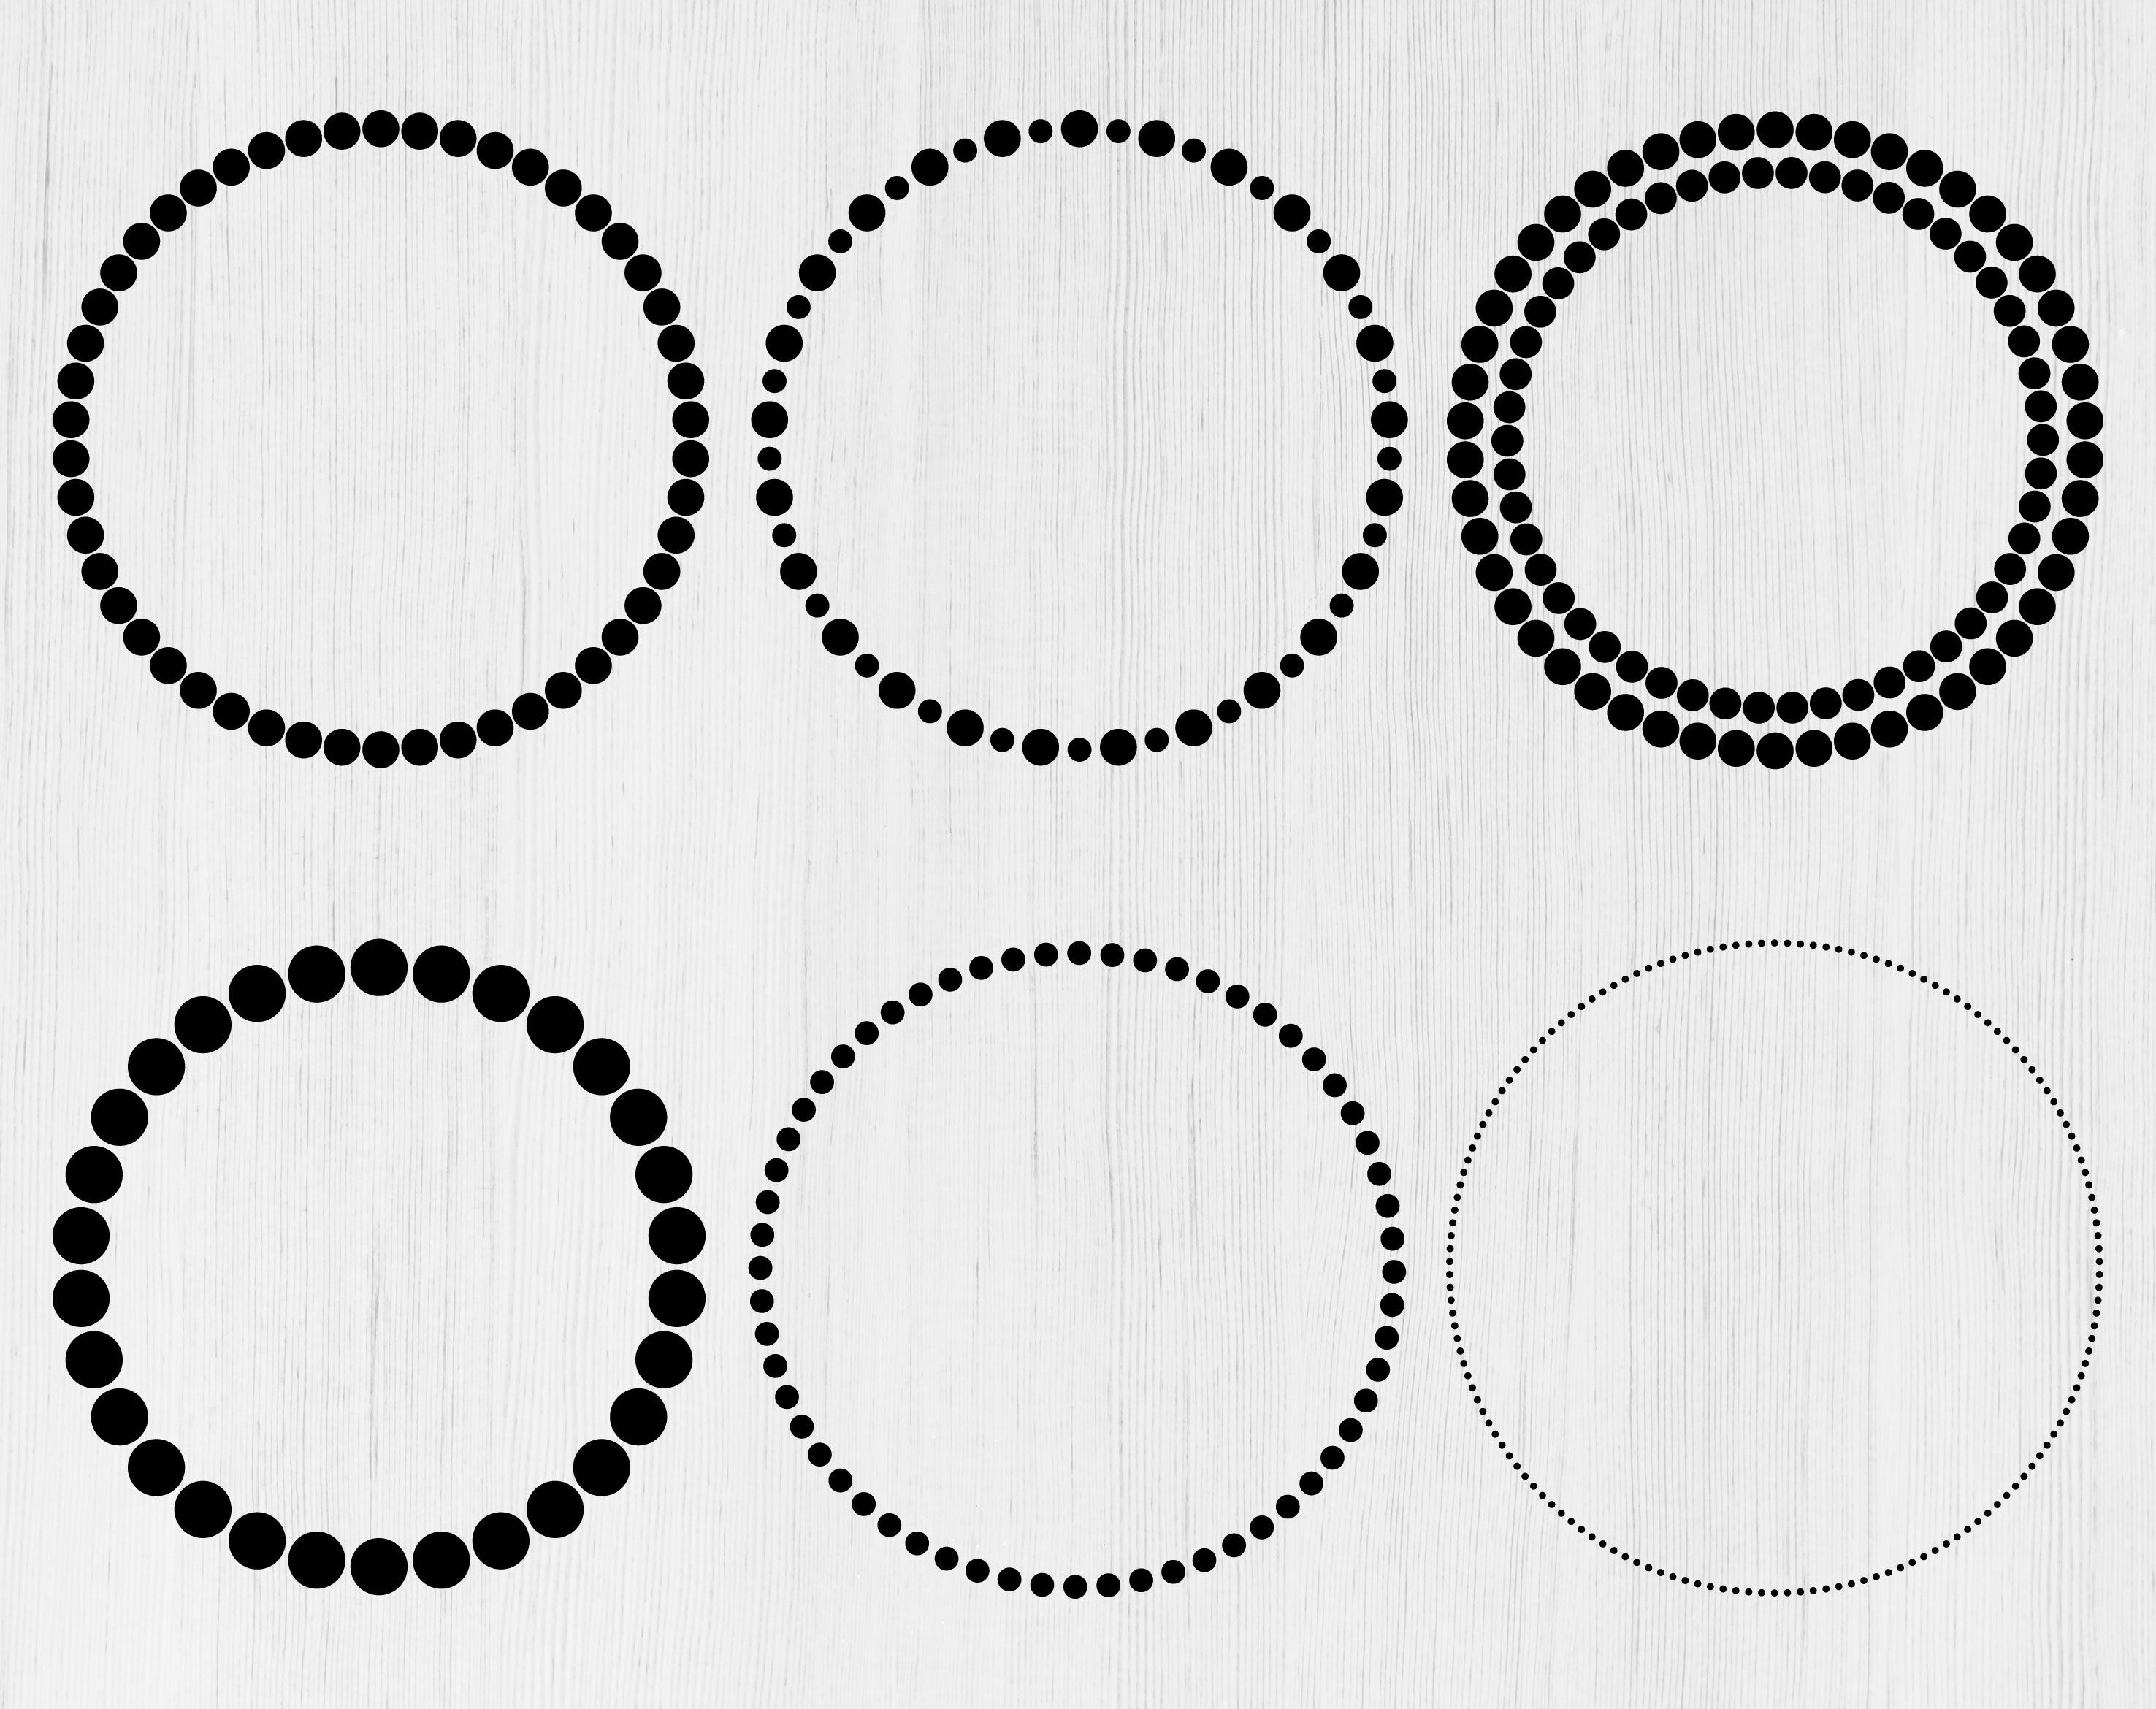 Dotted Circle Svg Dotted Circle Frame Svg Monogram Frame Svg Etsy In 2021 Circle Frames Monogram Frame Wedding Frames